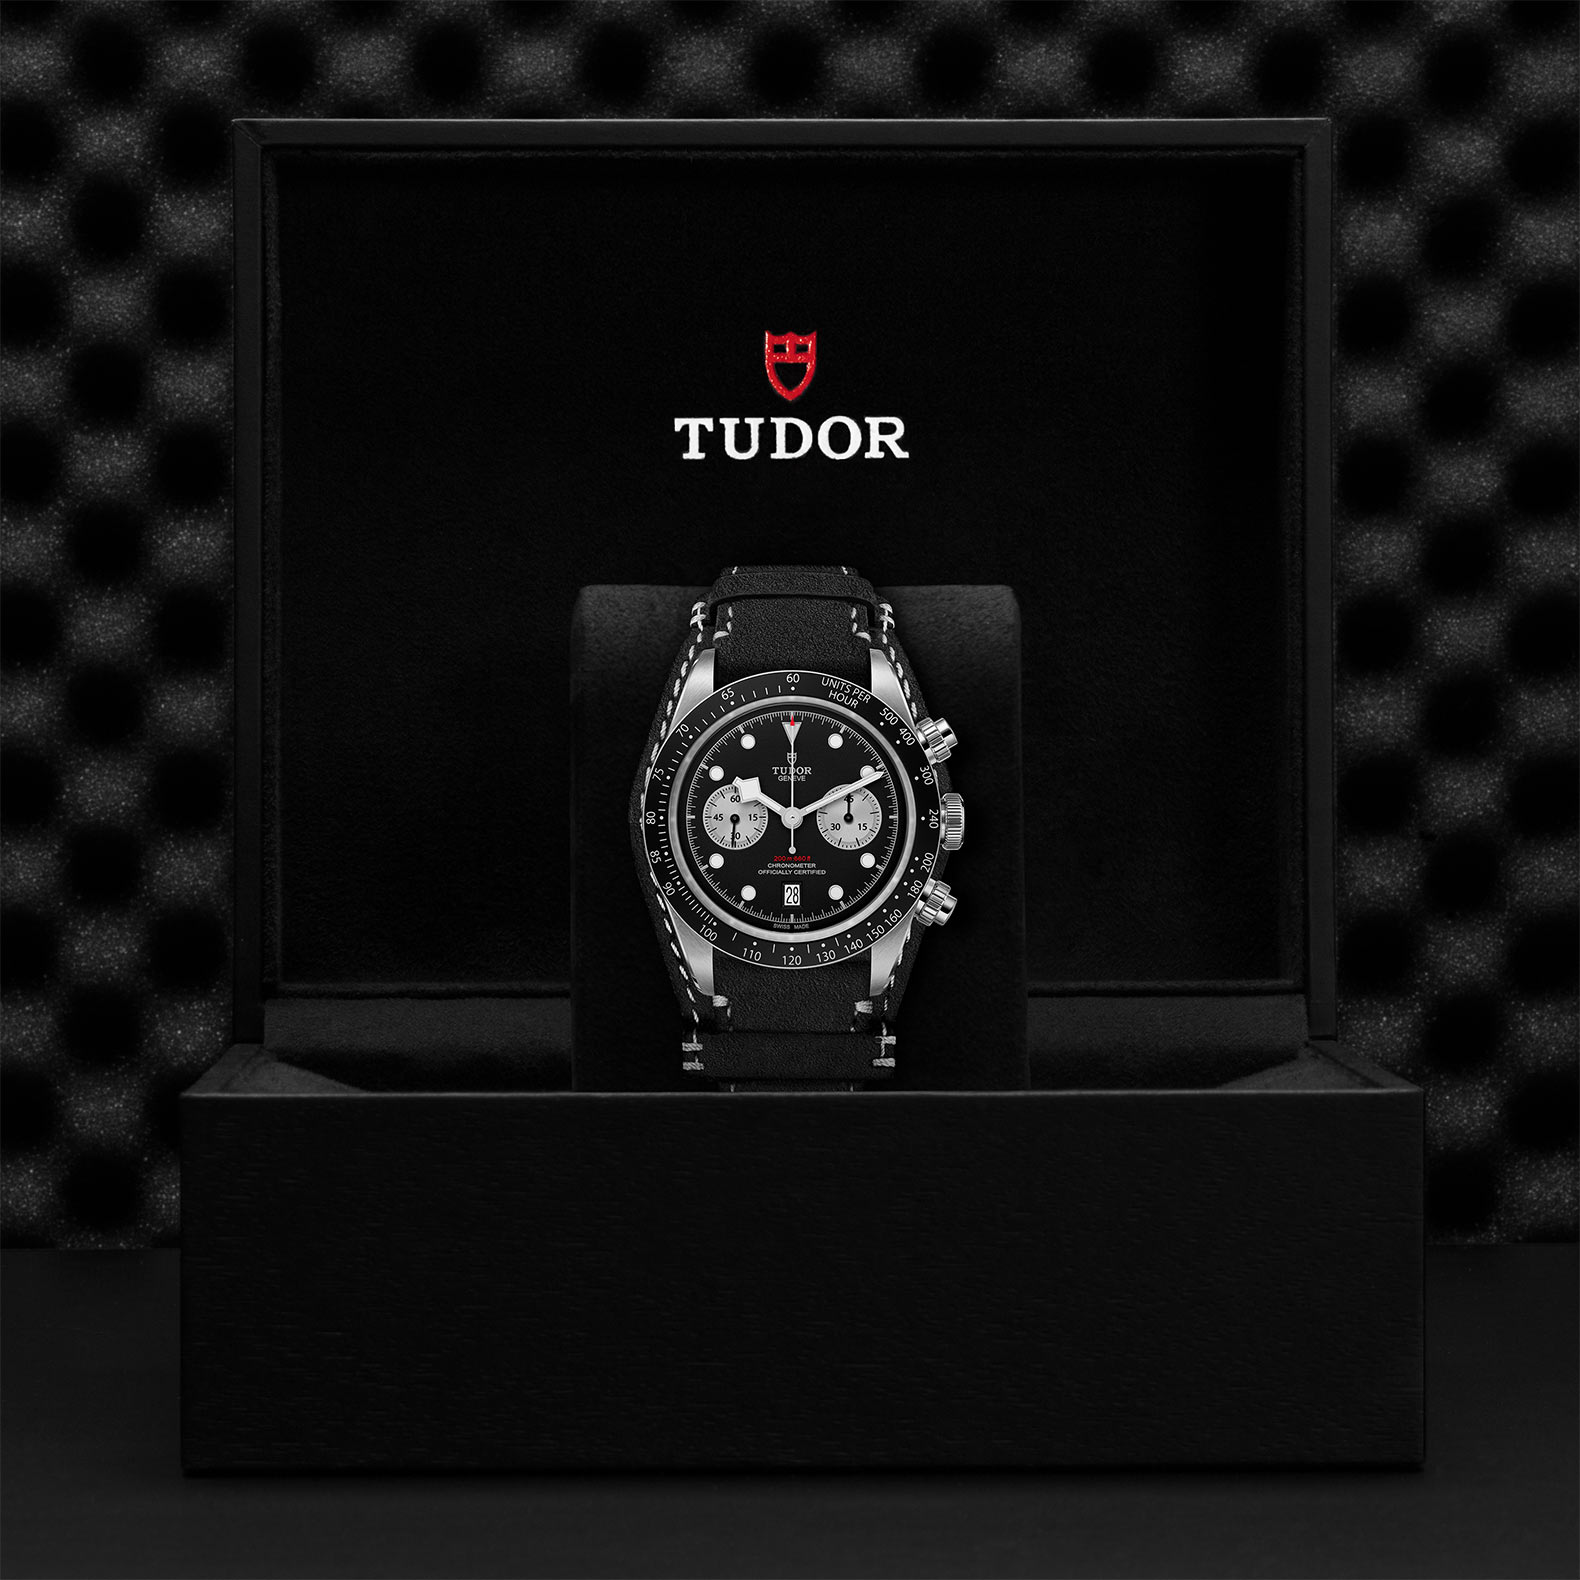 TUDOR Black Bay Chrono - M79360N-0005